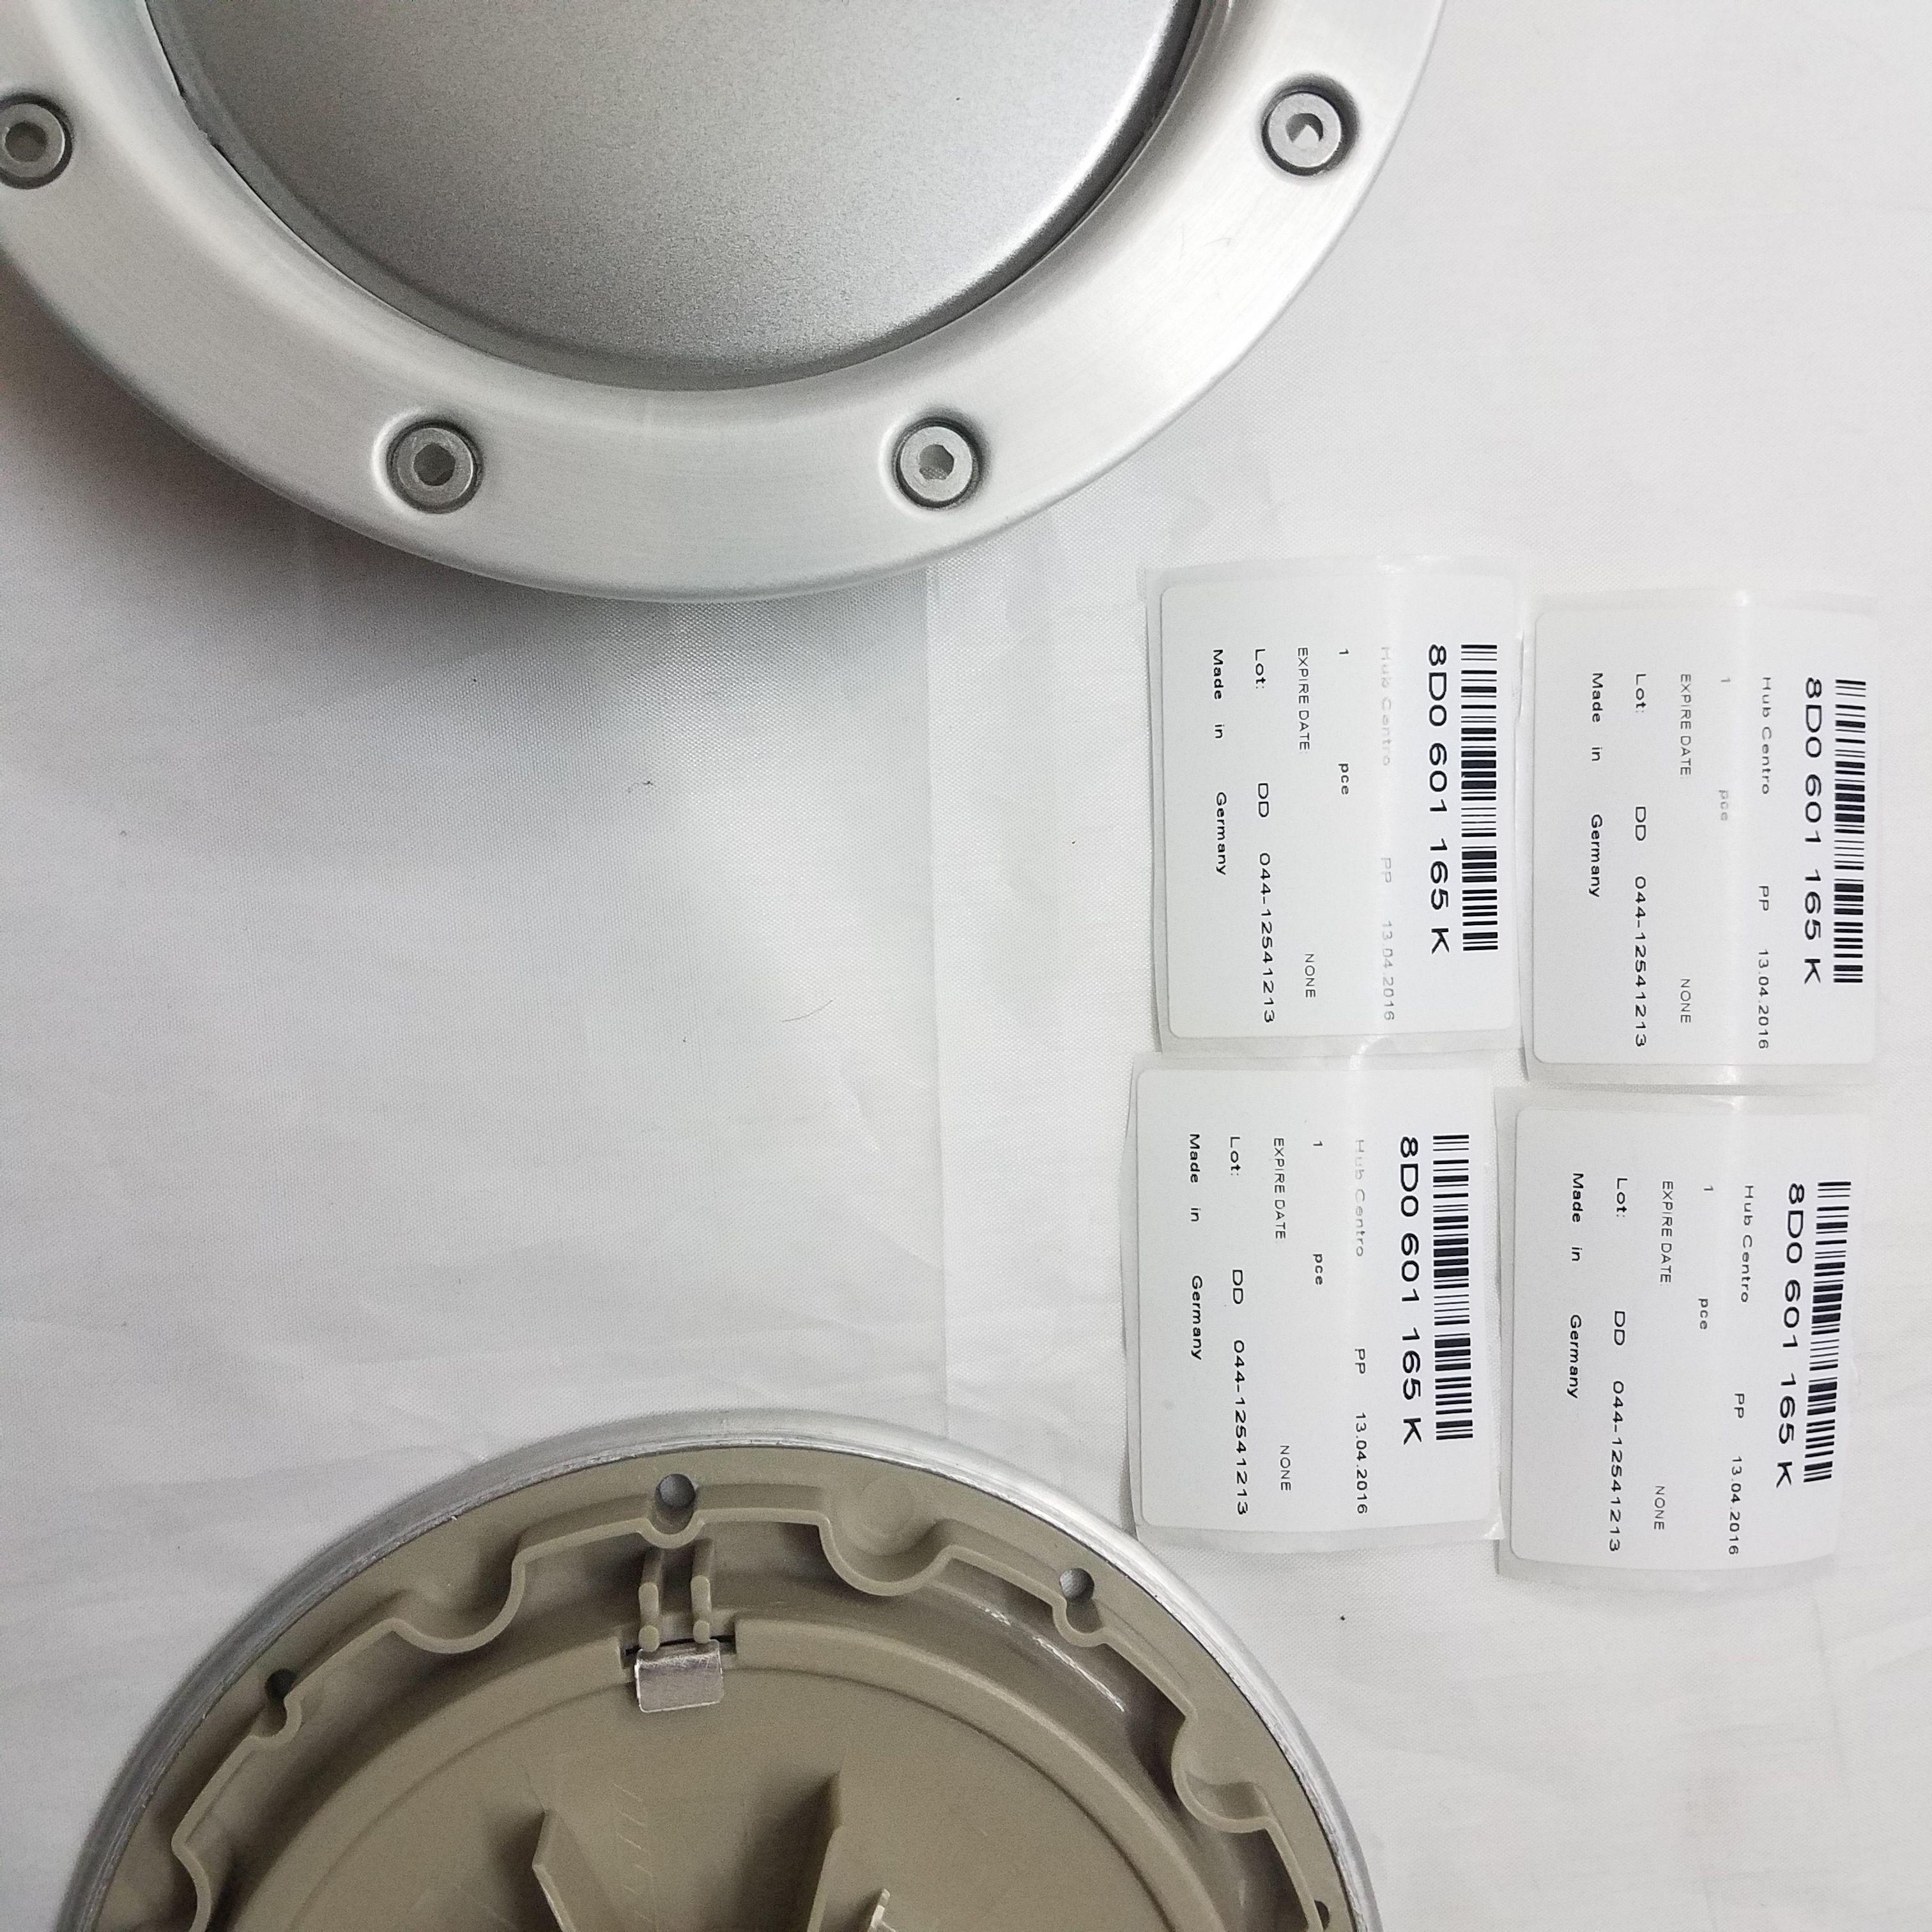 NEW 4pcs WHEEL CENTER CAPS RIM HUB CAP for   146mm 8D0601165K 8D0 601 165 K